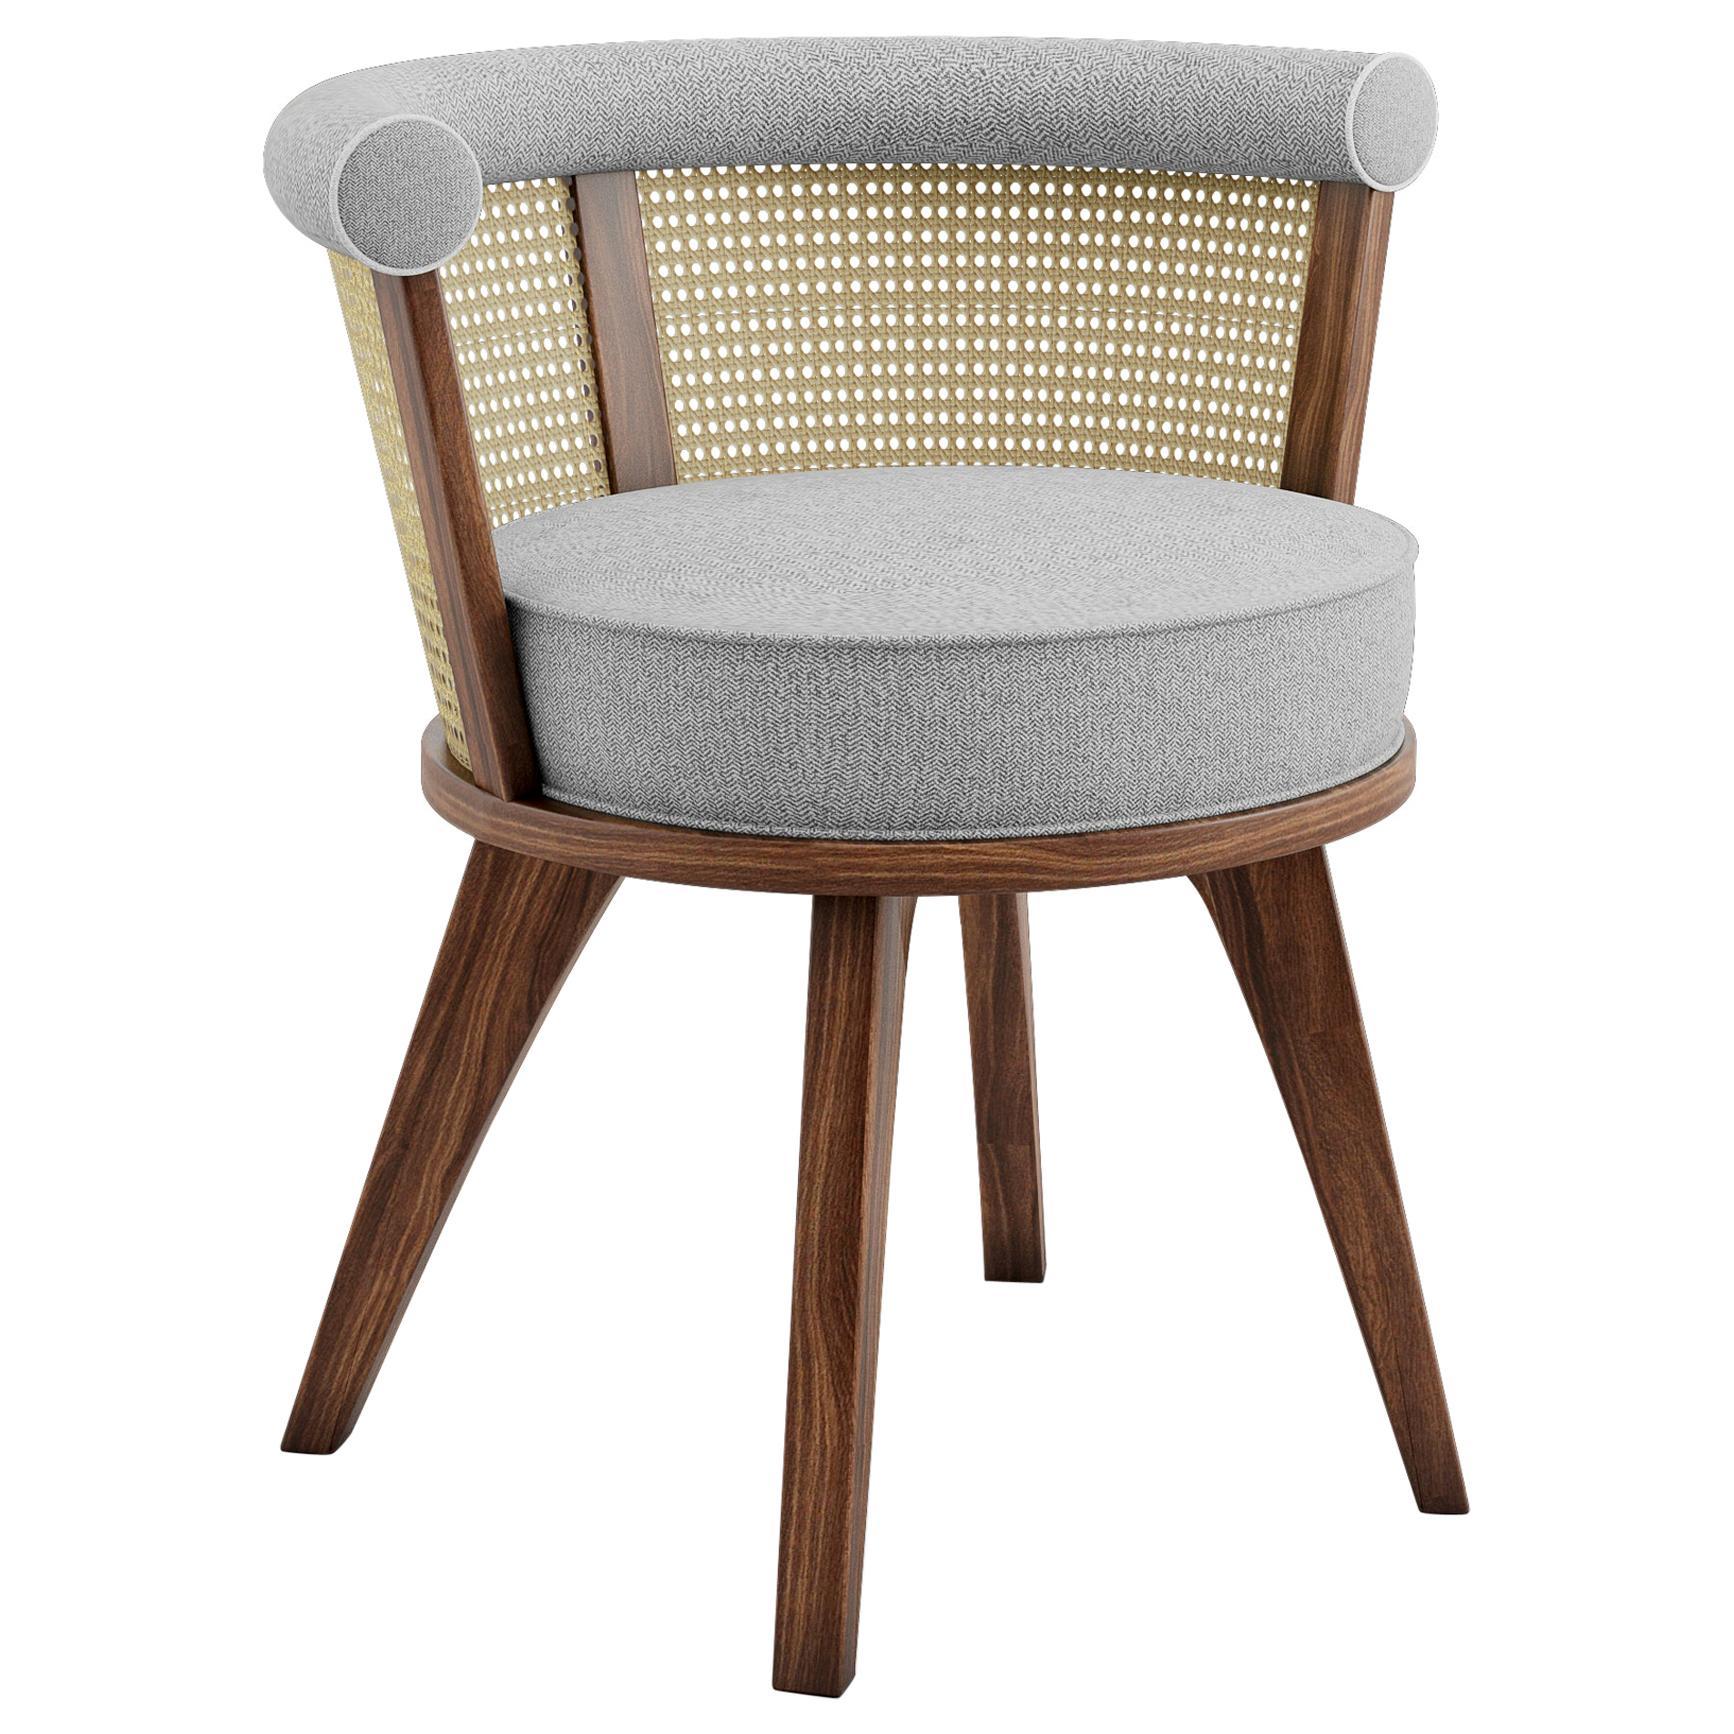 20th Century Linen Rattan George Dining Chair Walnut Wood